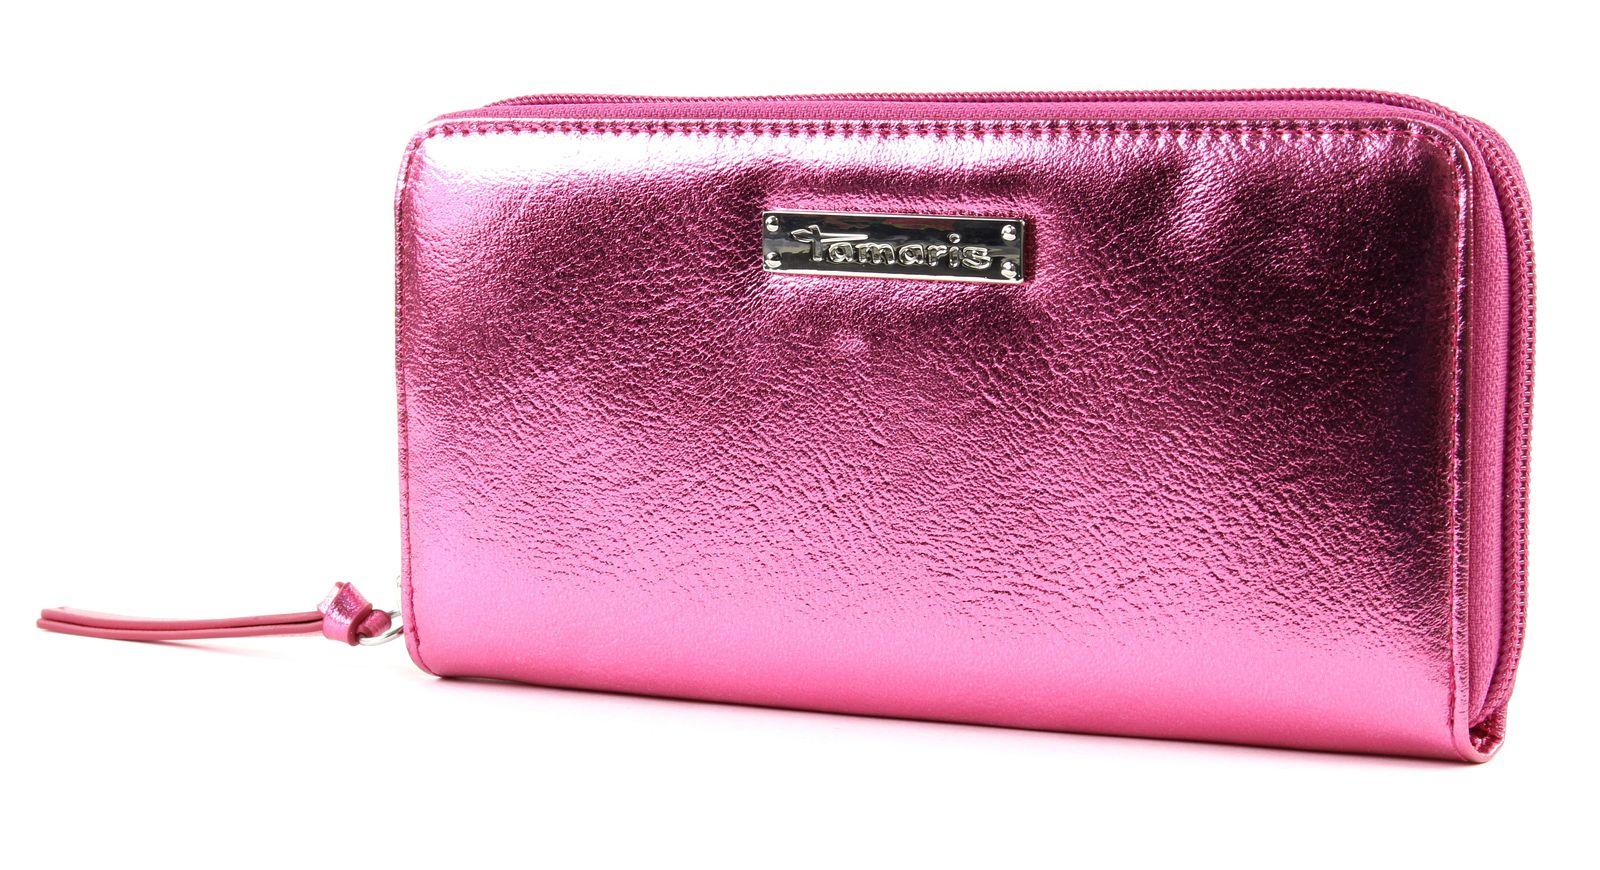 95c38f0dd8cc Tamaris DEBRA Big Zip Around Wallet Pink